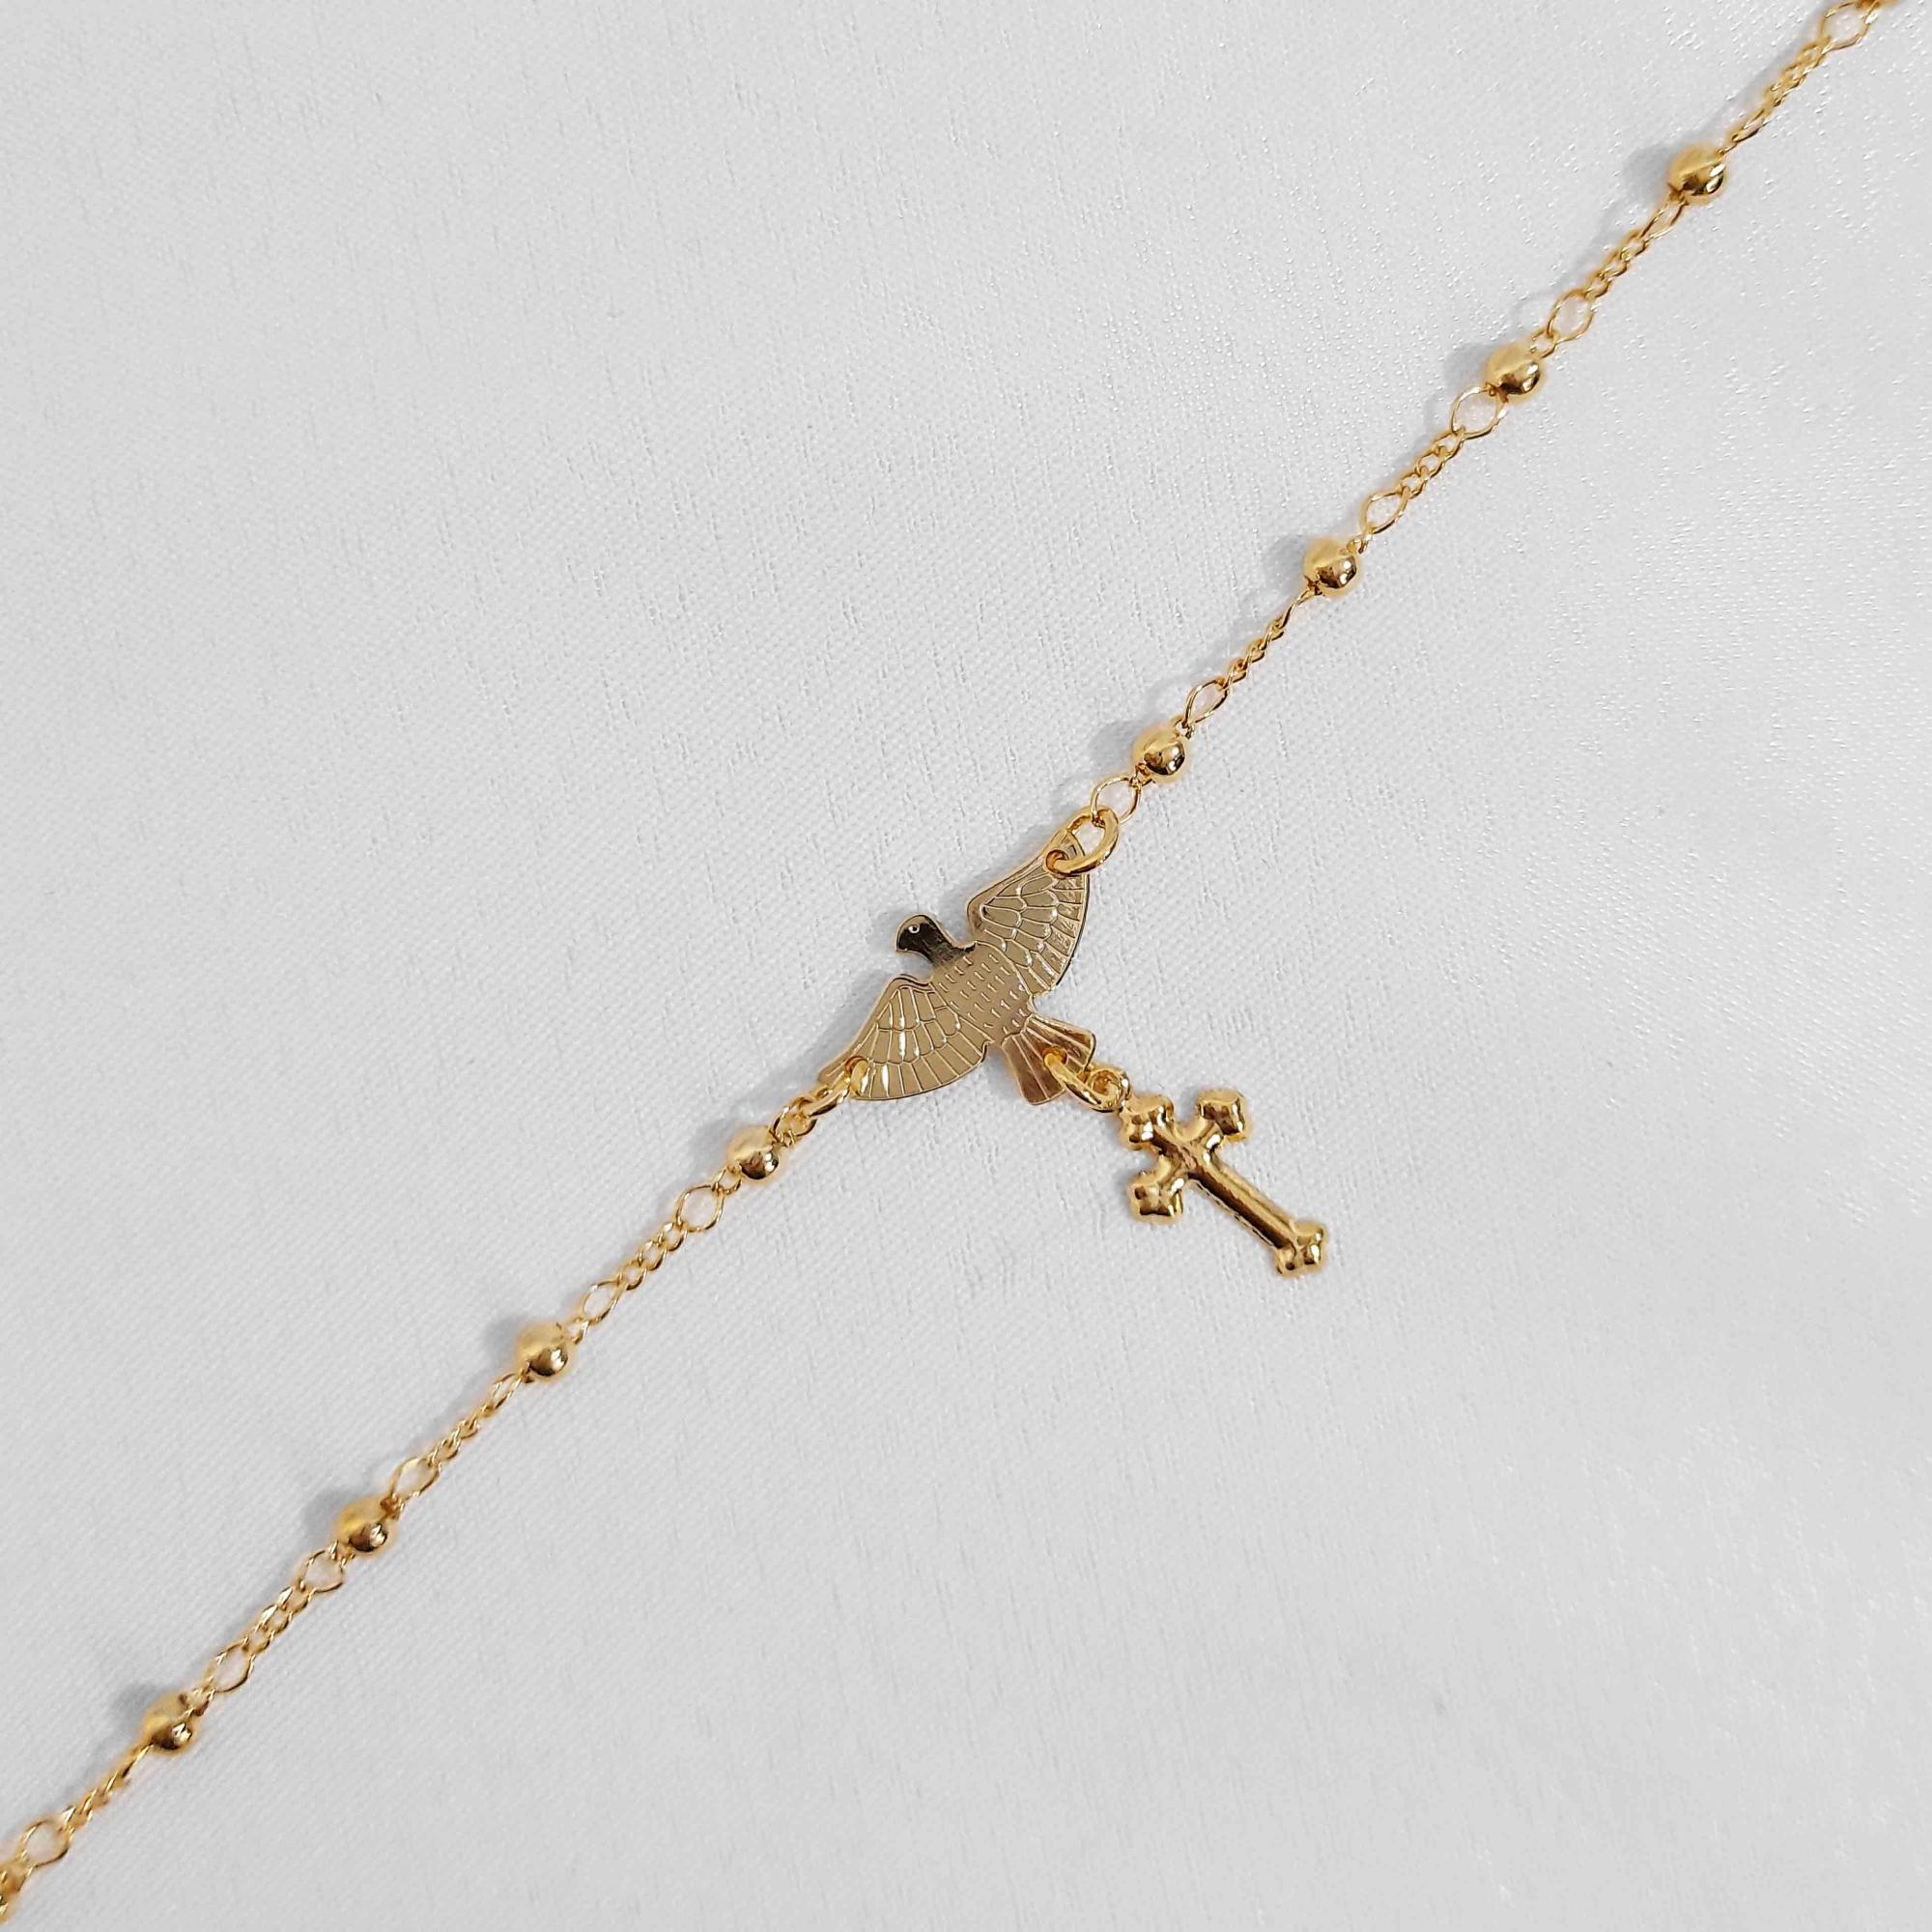 Pulseira Terço Espirito Santo Folheado a Ouro 18K  - Lunozê Joias